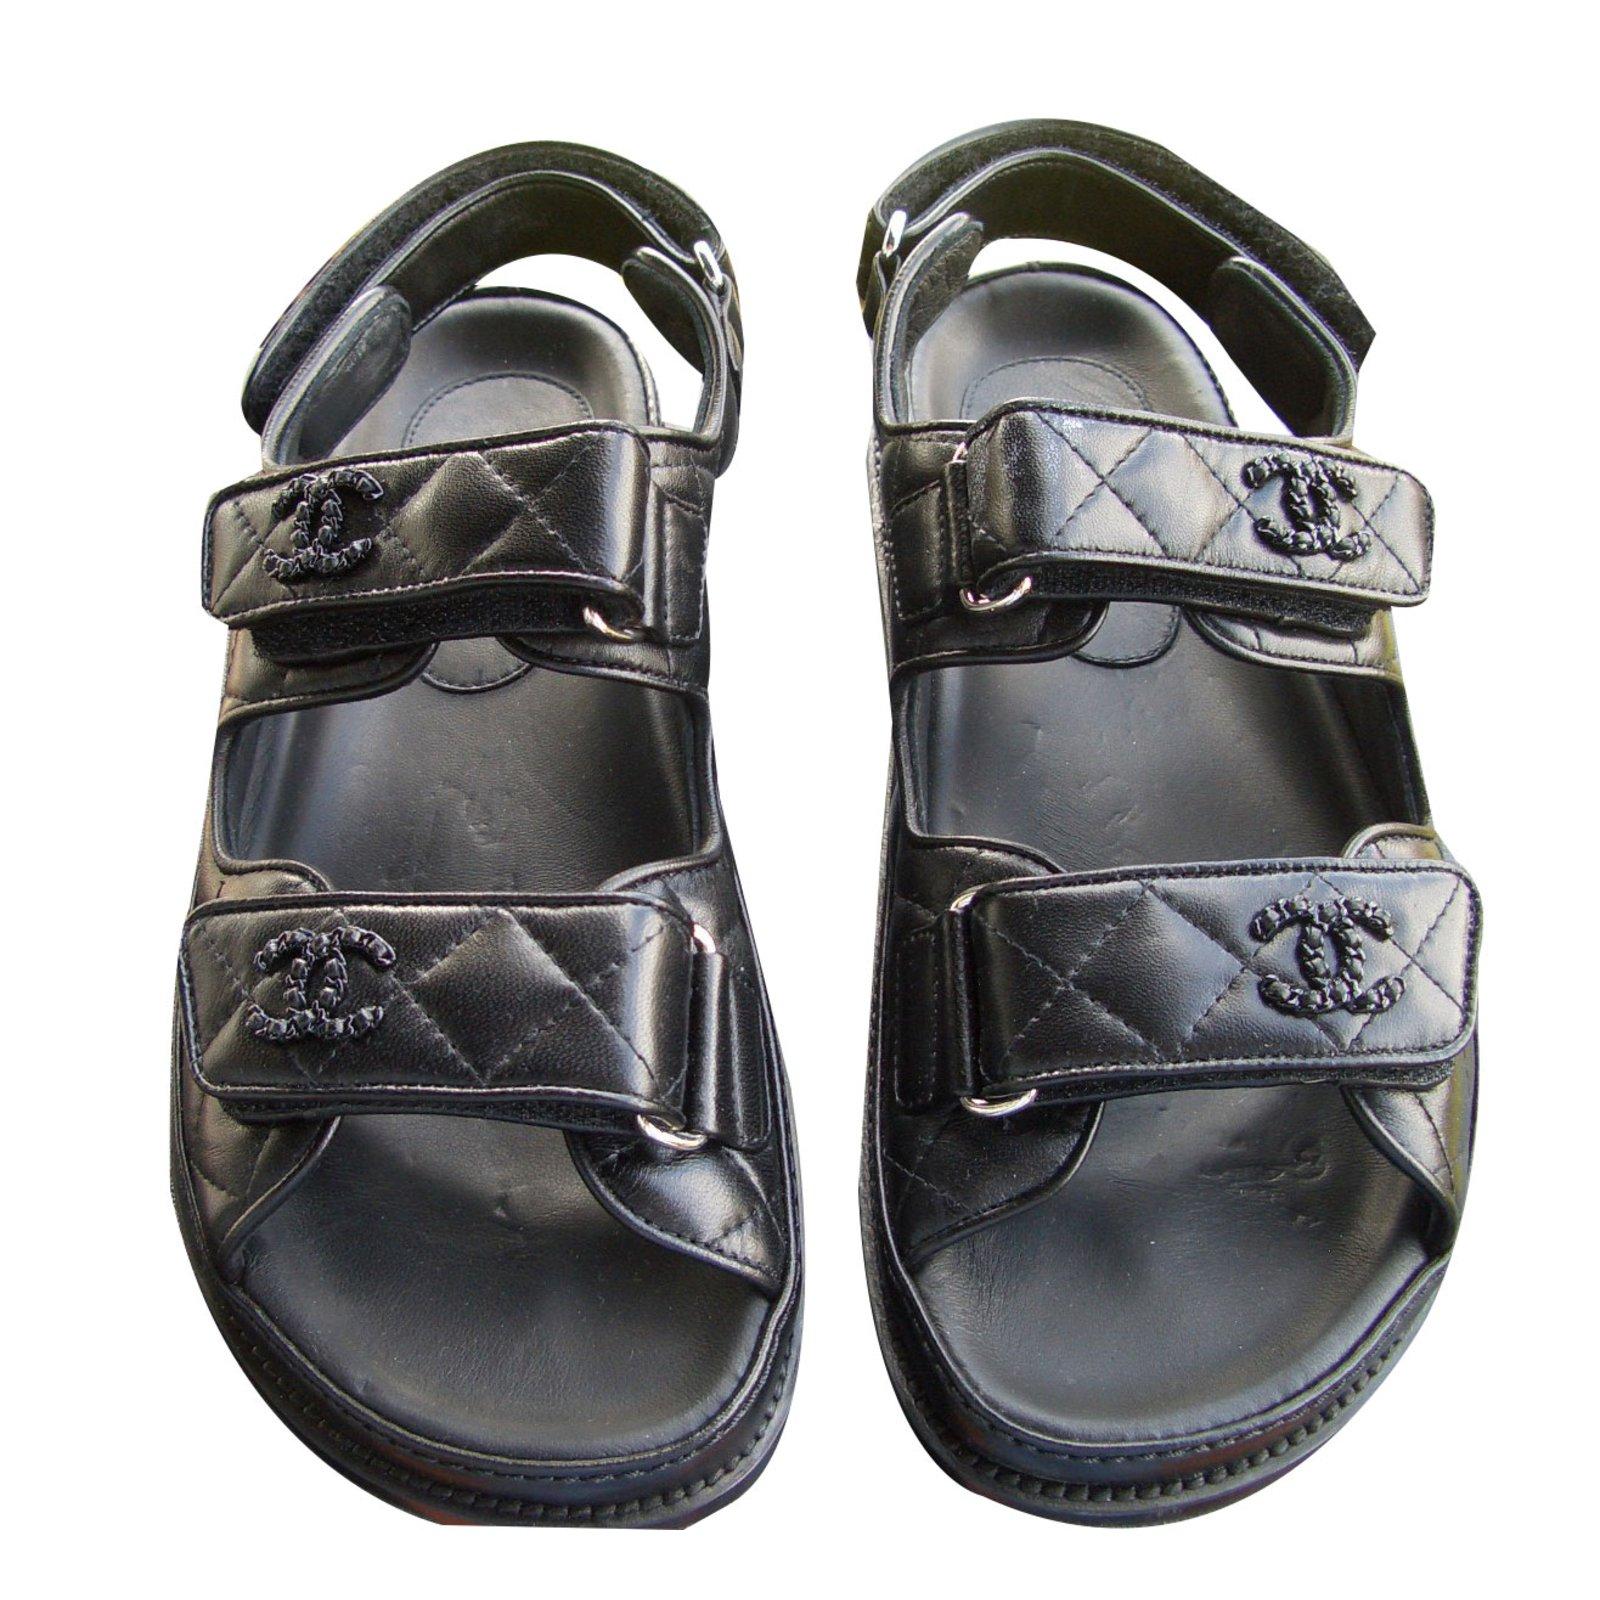 Chanel Sandals Sandals Leather Black